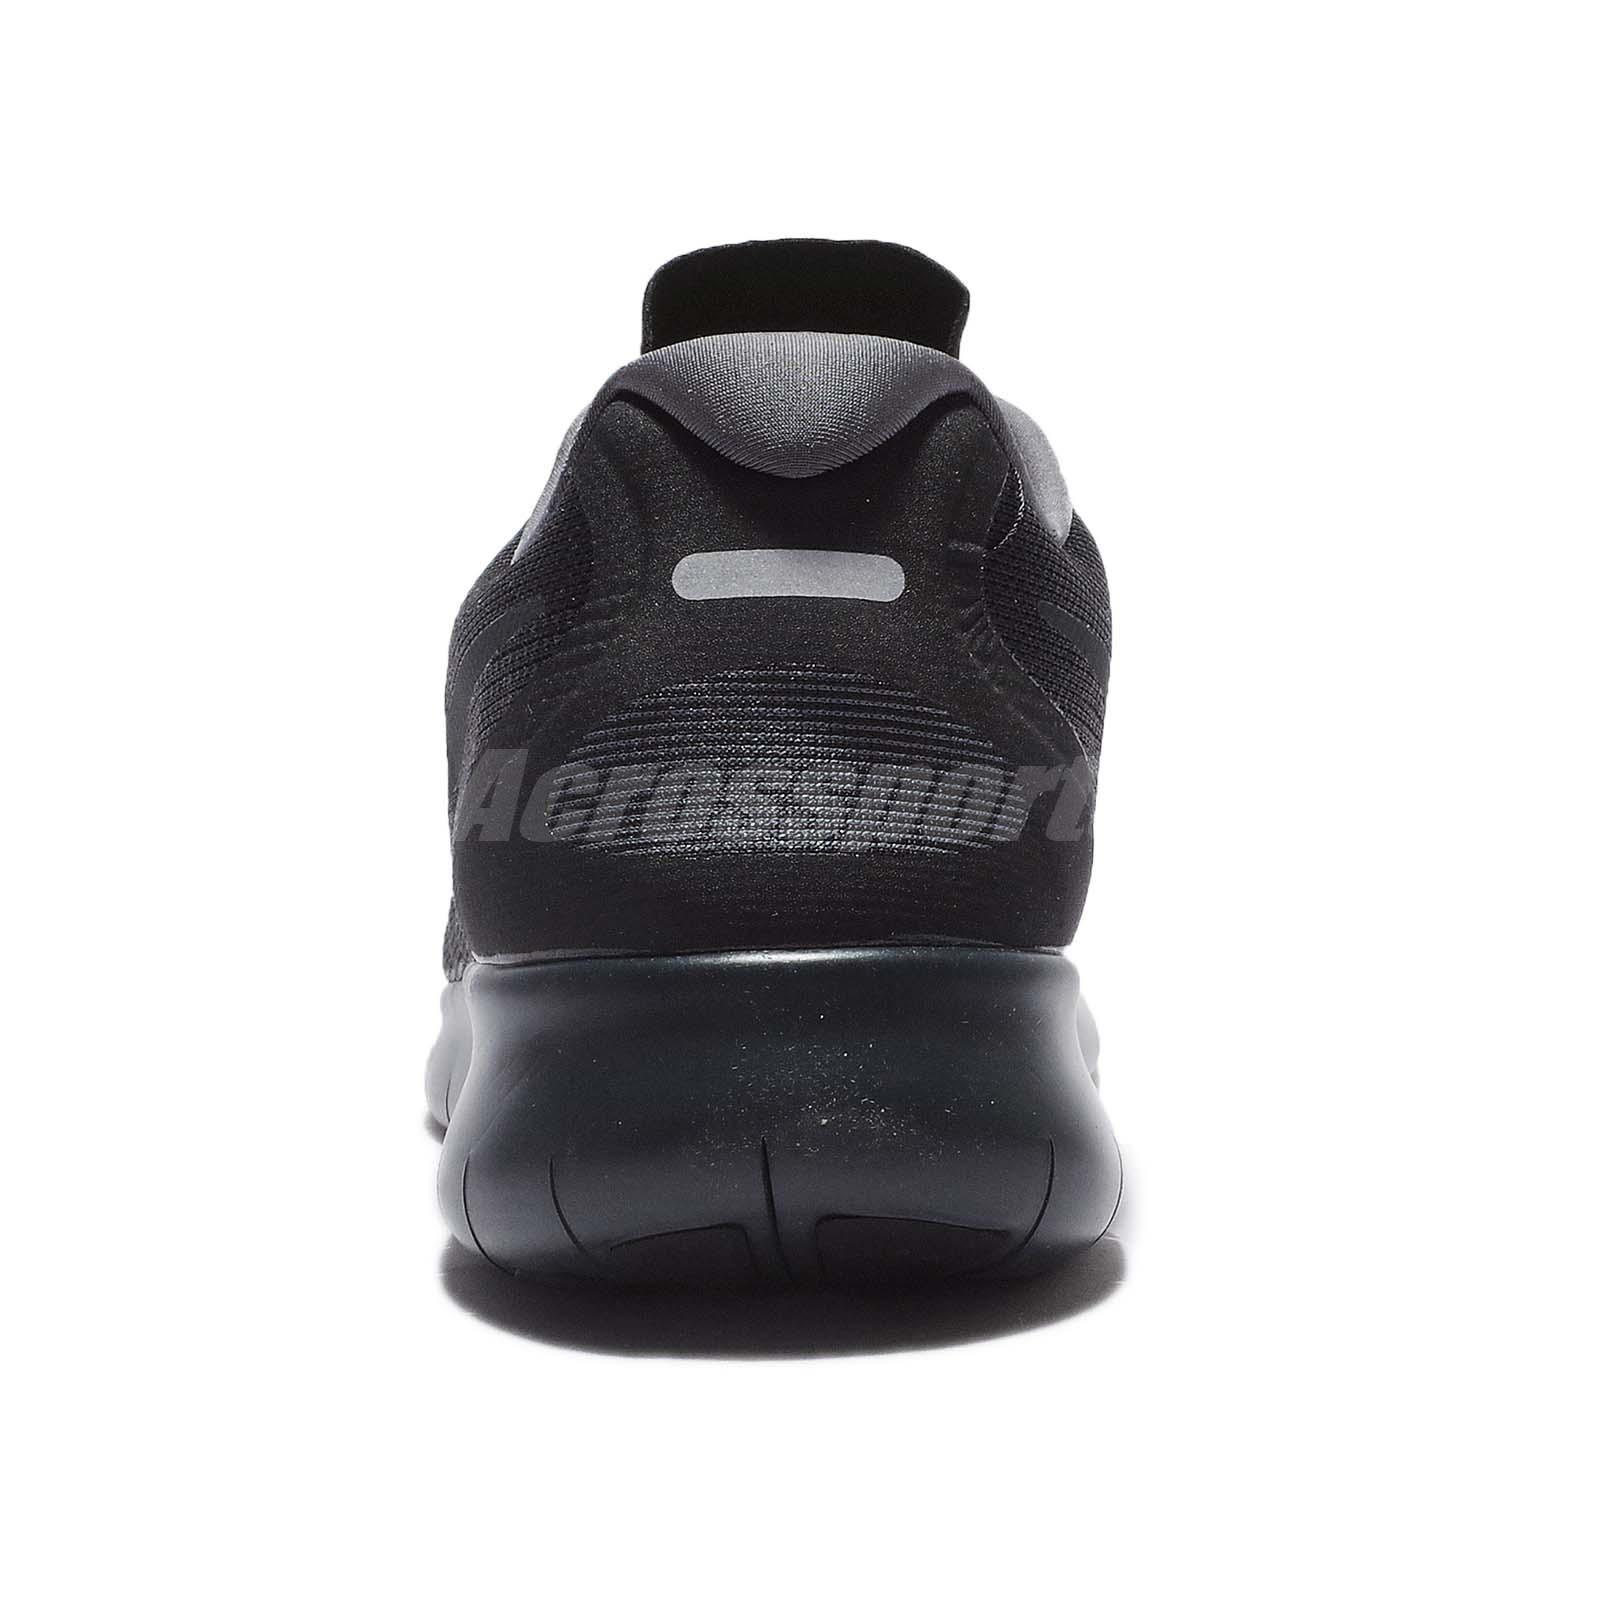 c7ac6ee5e1c62 Nike Free RN 2017 Run Black Anthracite Men Running Shoes Sneakers ...